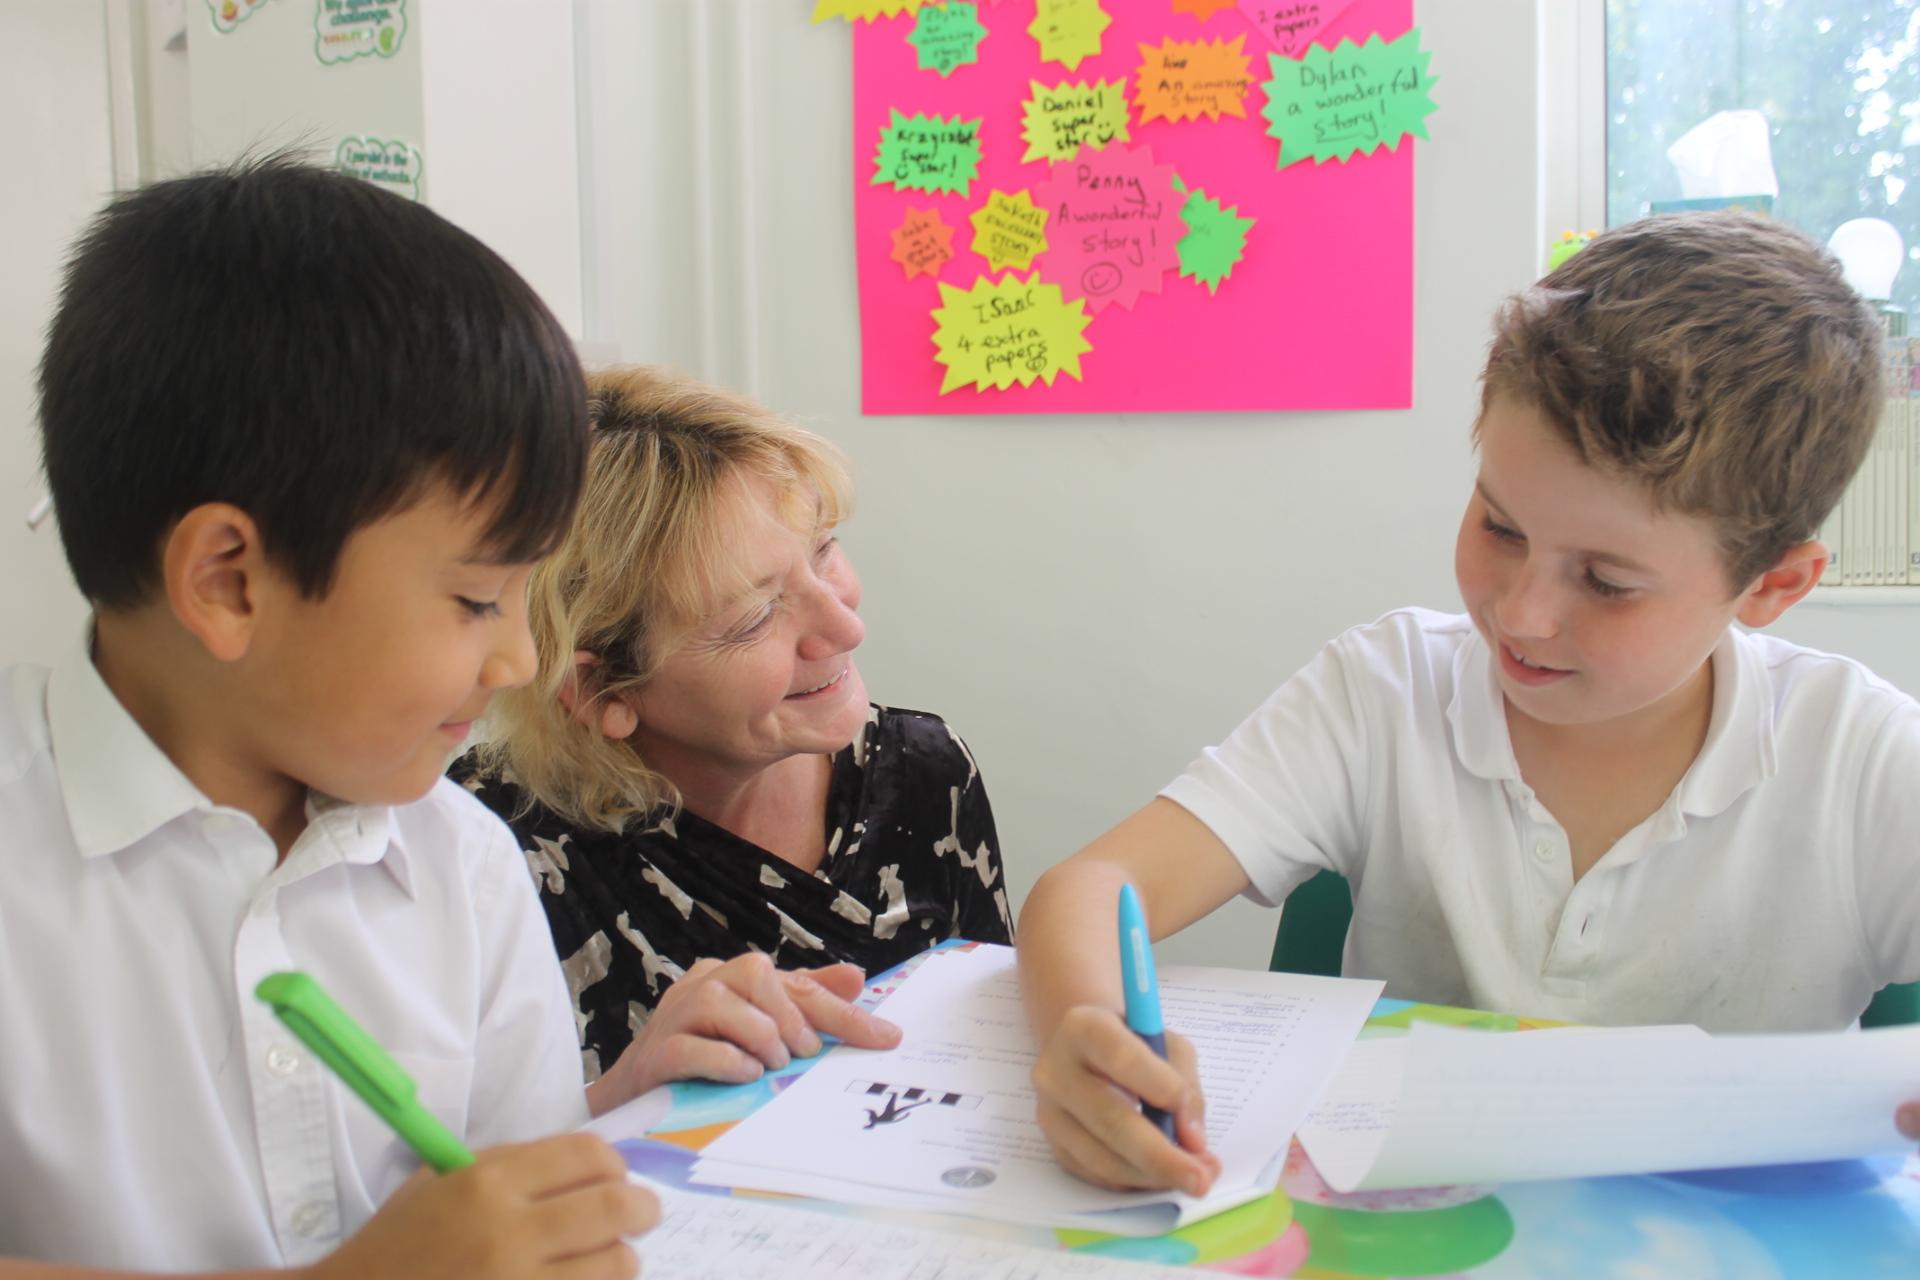 Jacqui Teaching 11 Plus Students